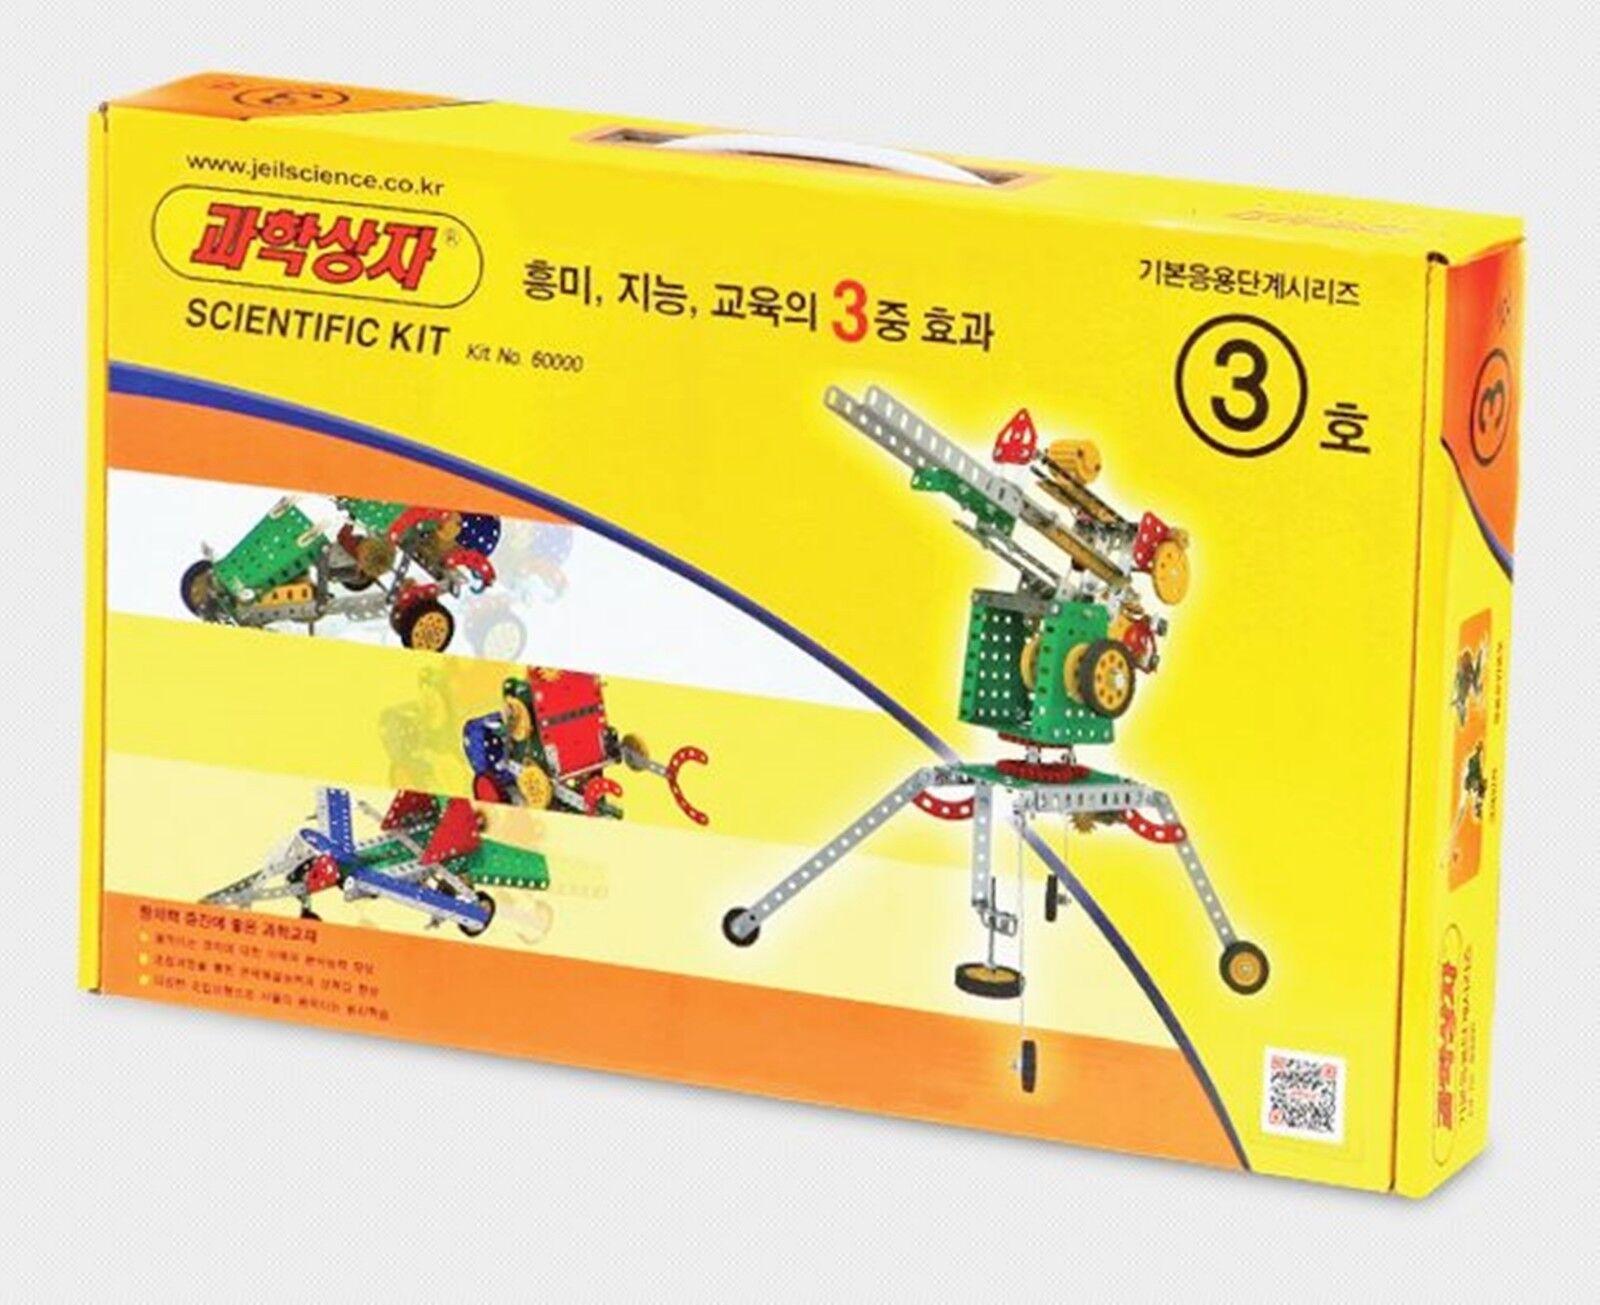 Korea Educational Scientific Model Kit  STEP 3  - Making 18 Types of Models